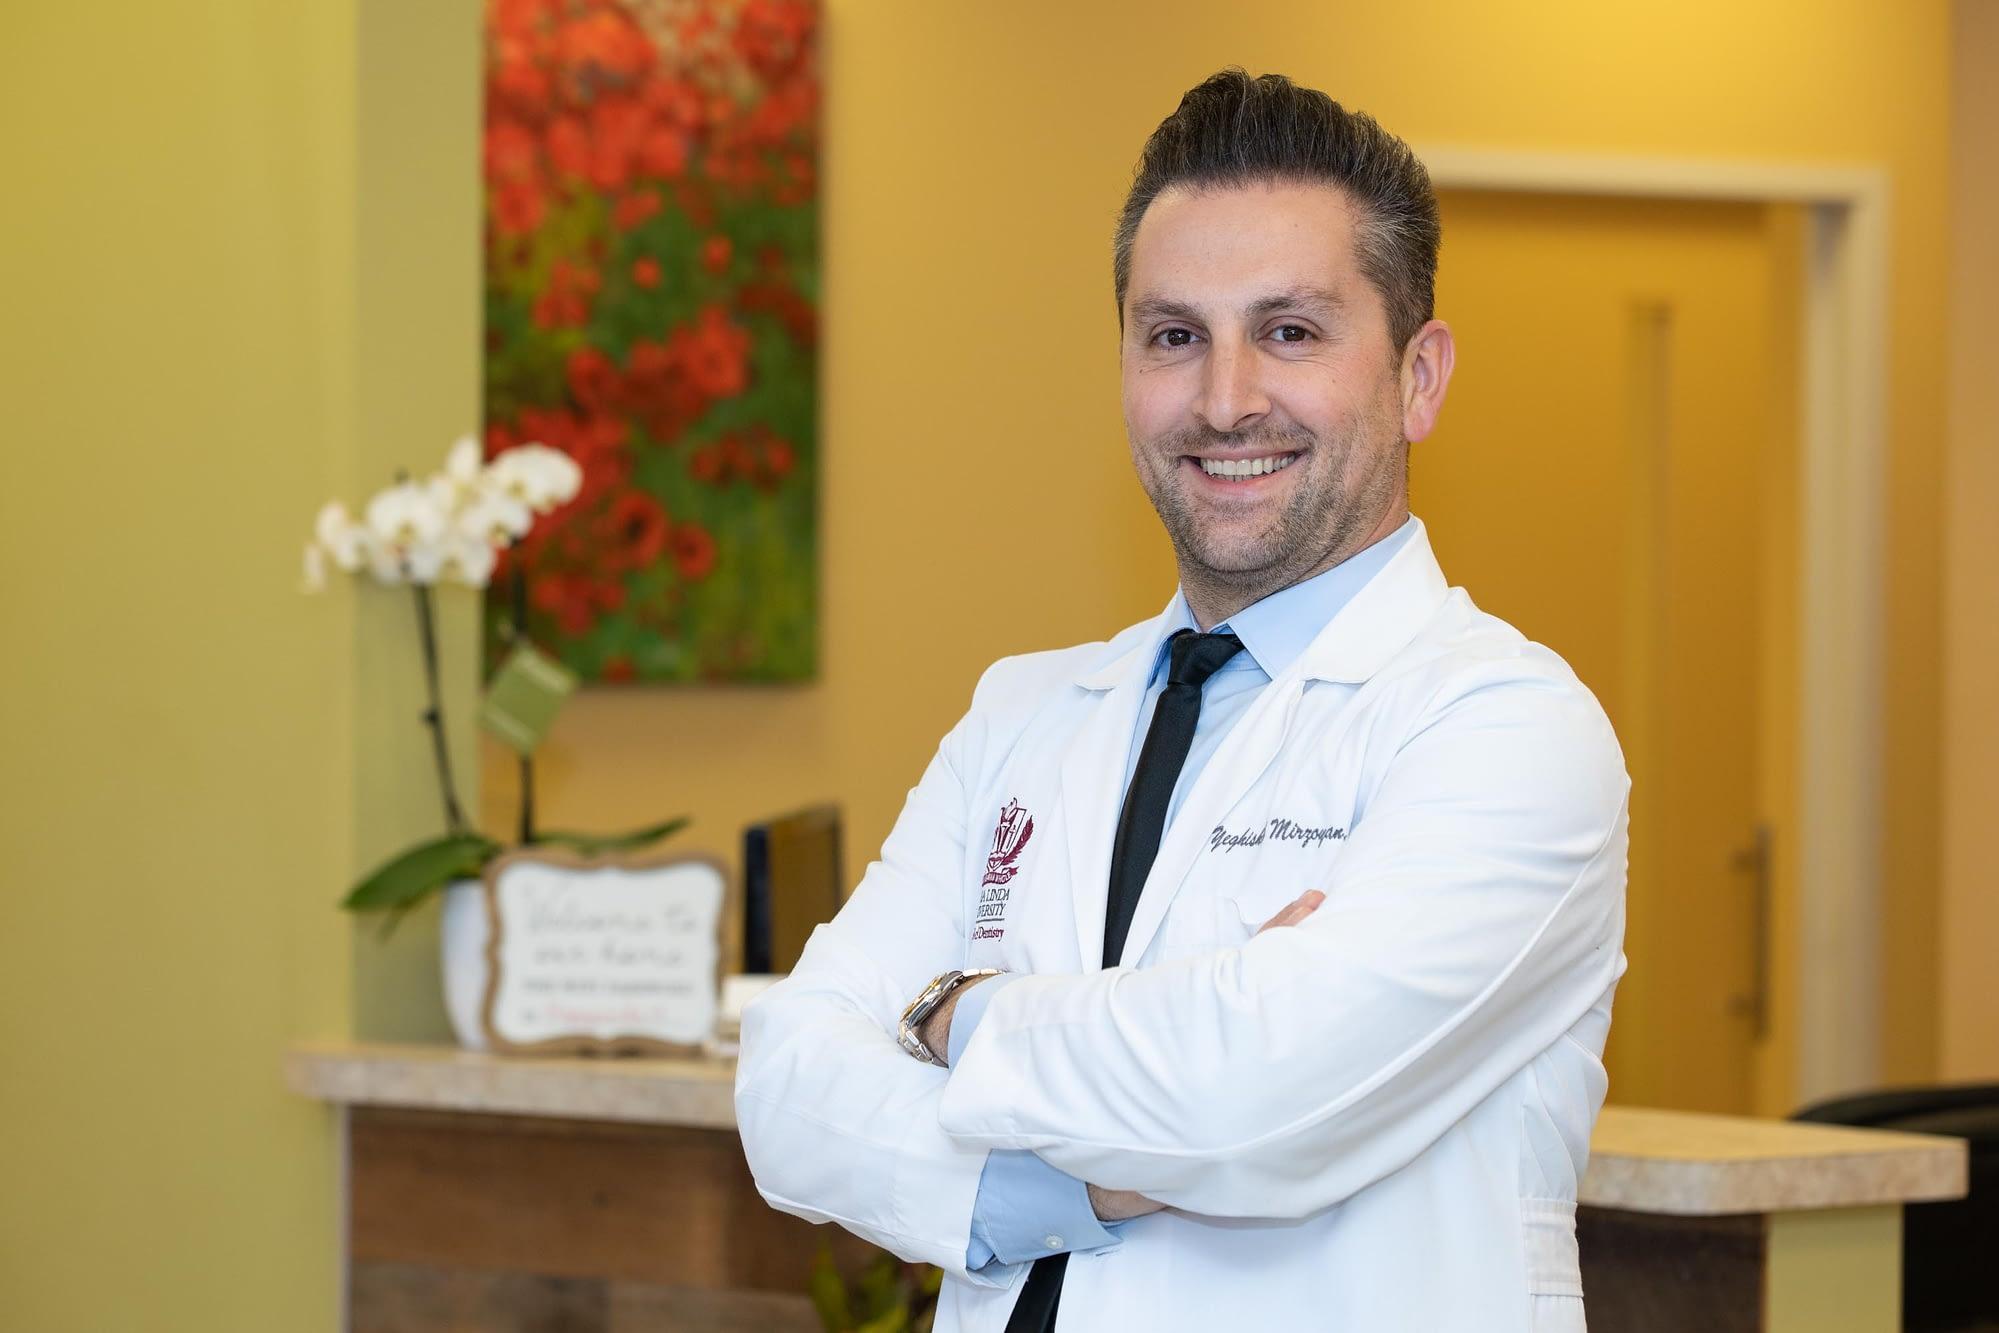 Dr Mirzoyan talking about dental implants Van Nuys, CA